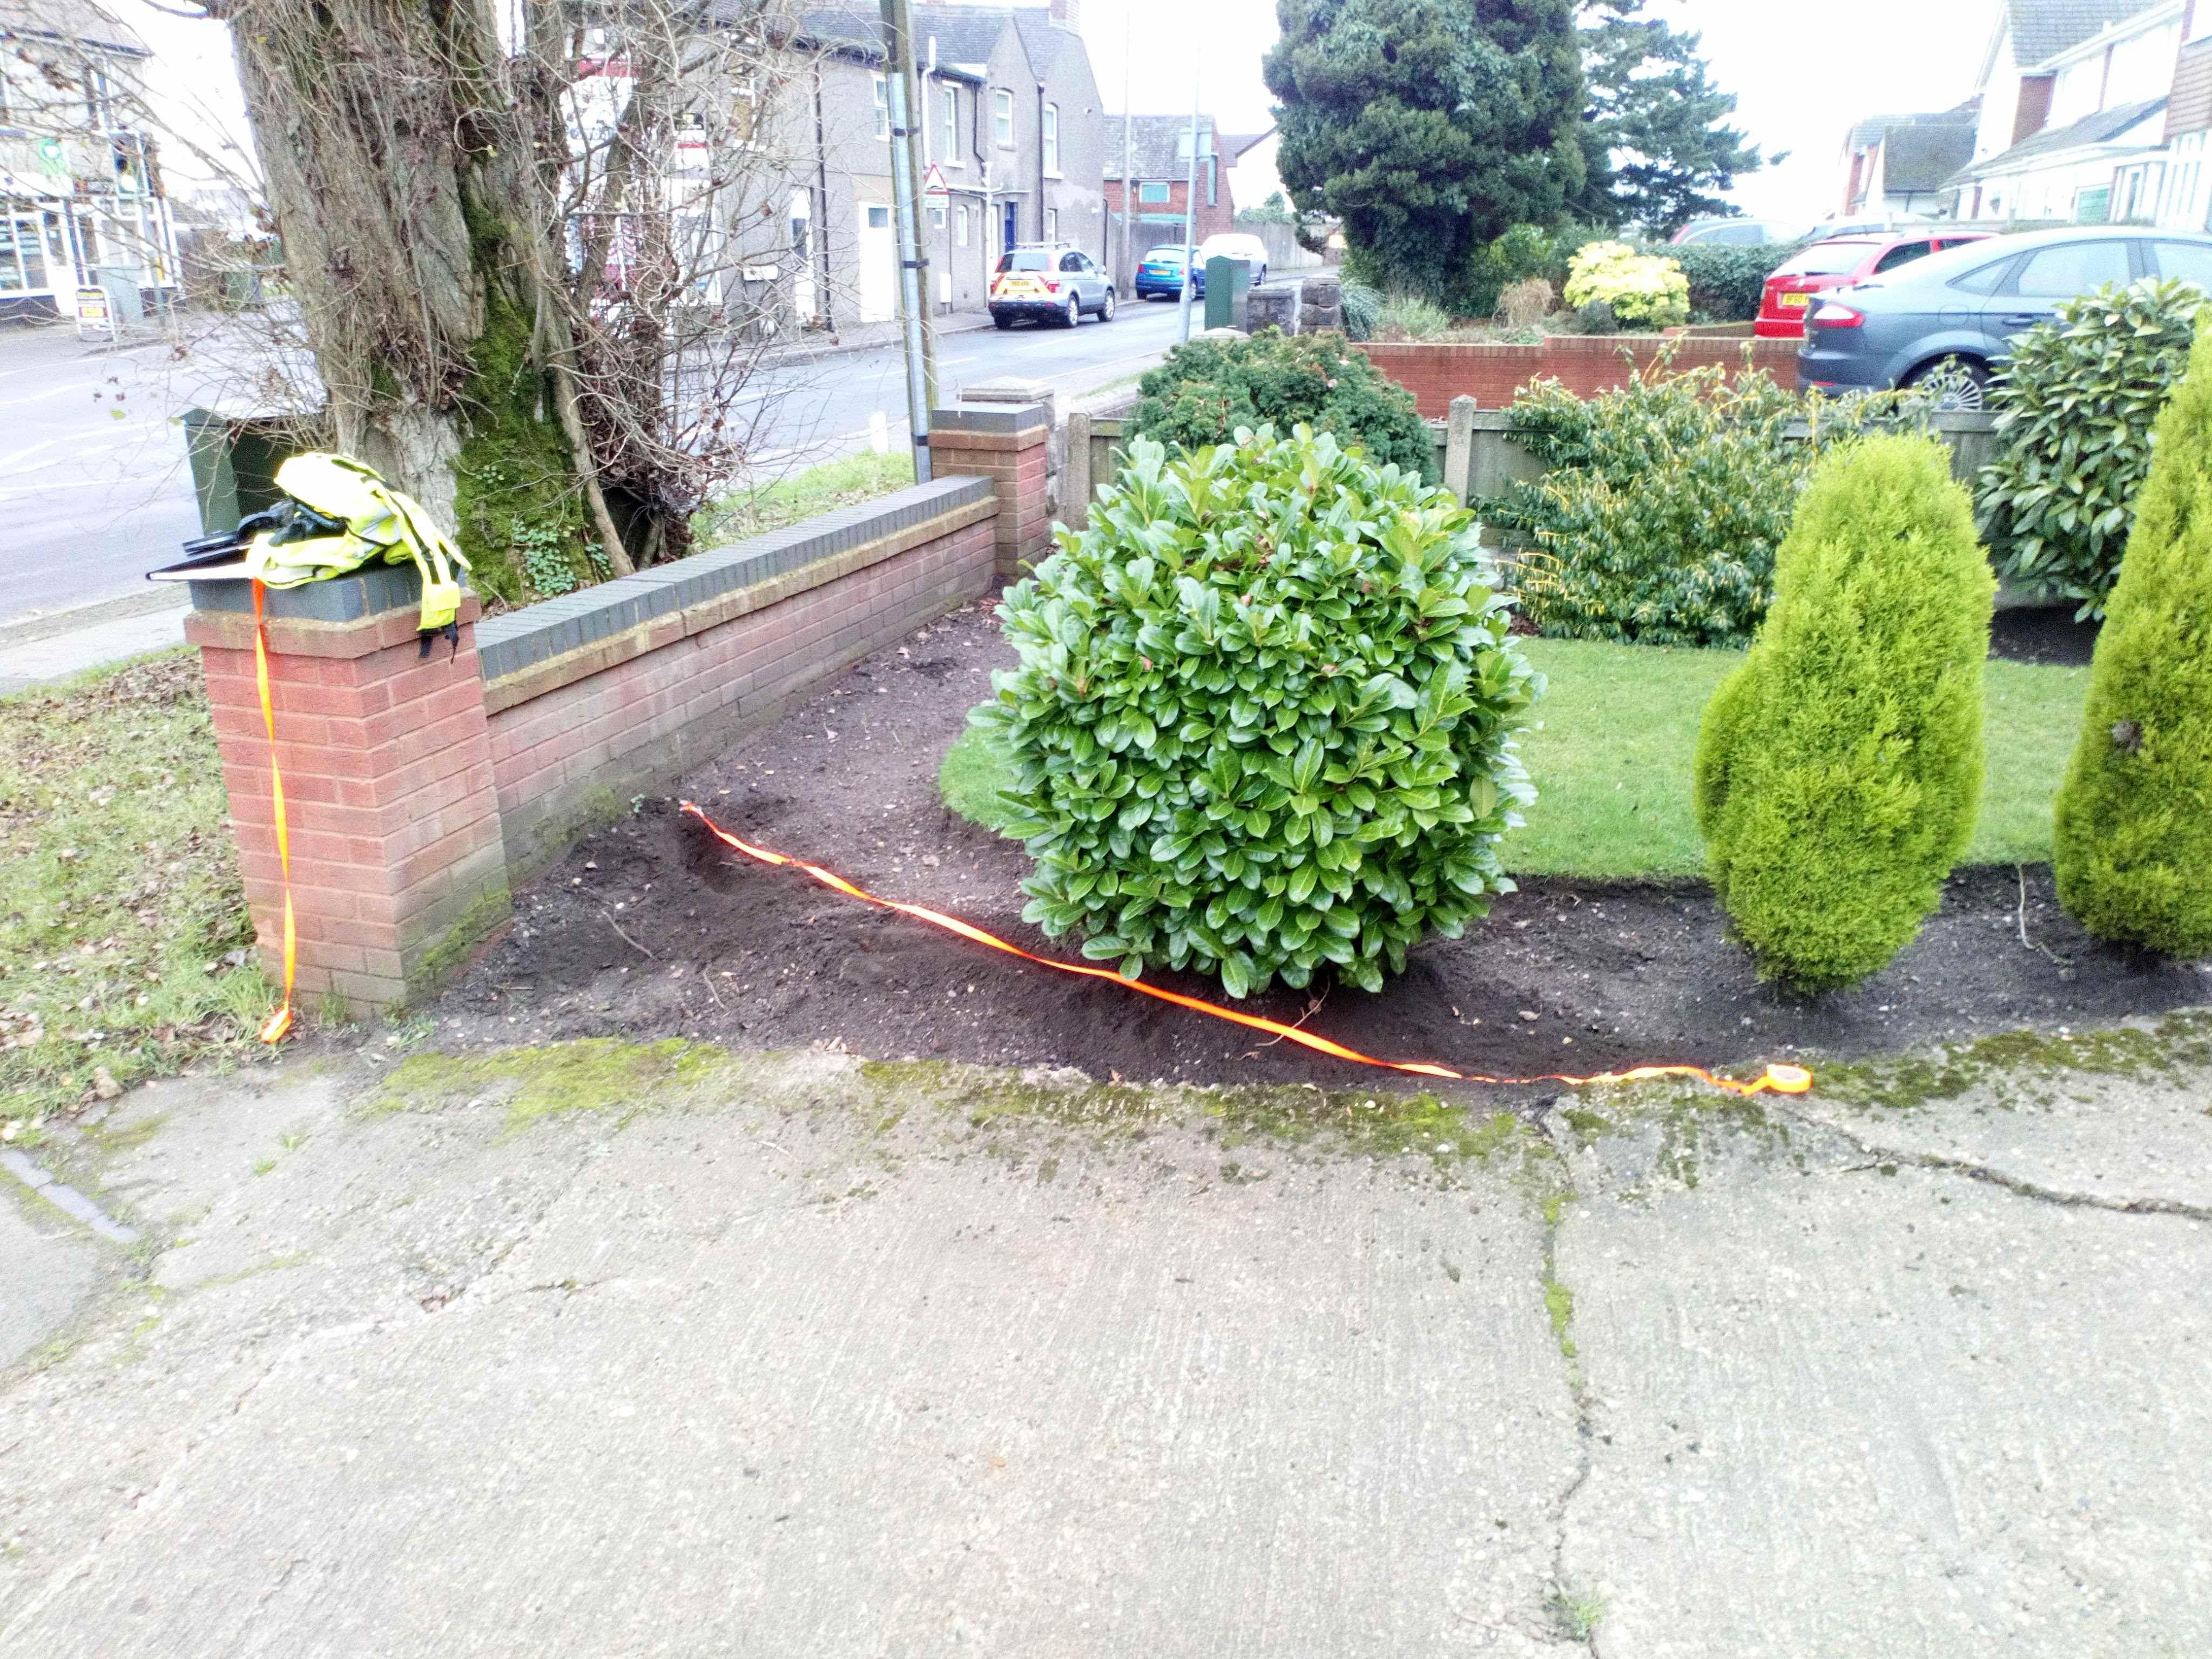 2017 / 2018 Investigation into Alleged Damaged from Poplar